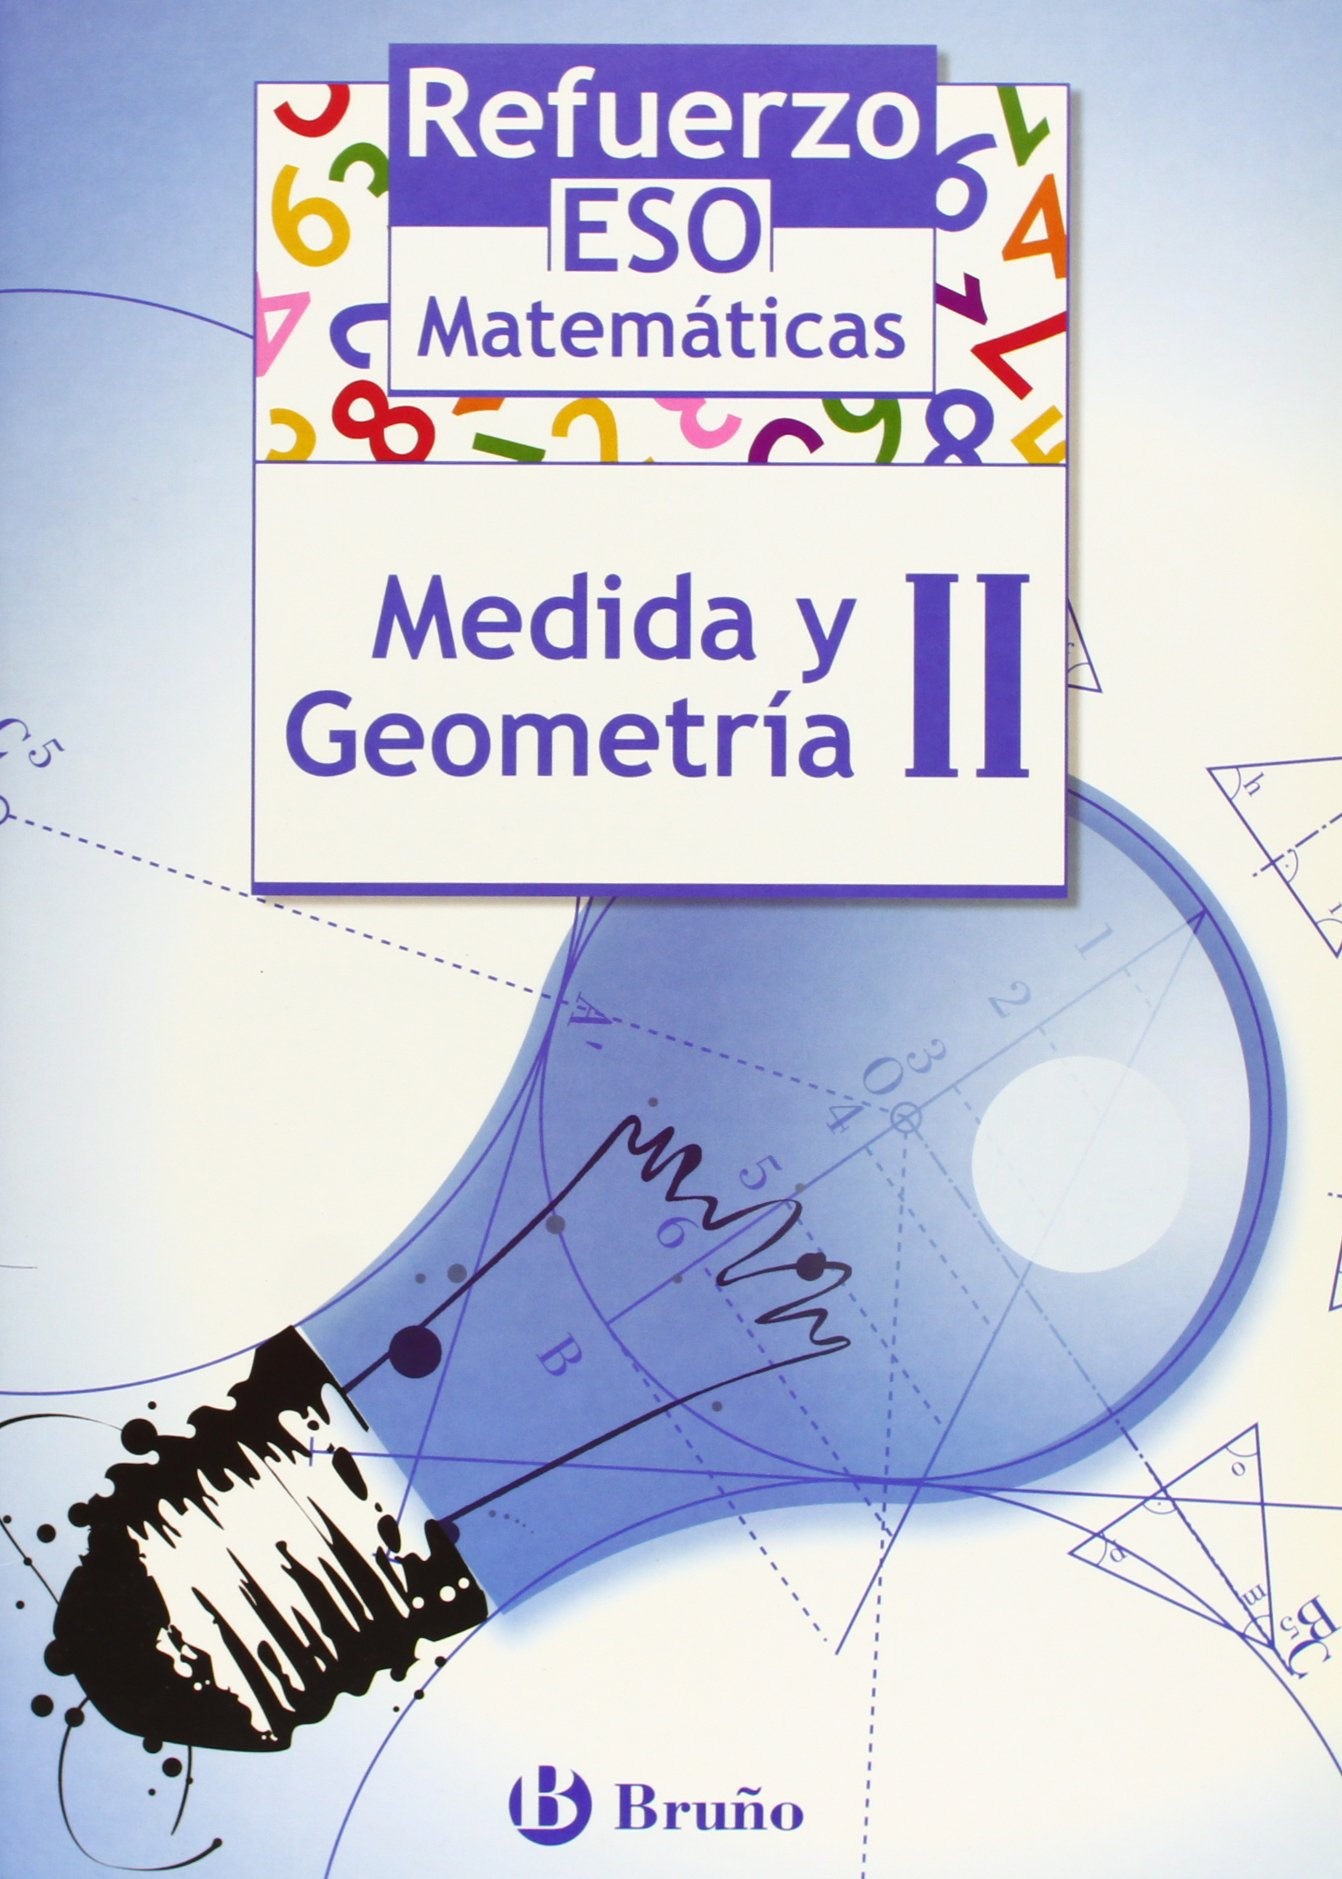 Refuerzo Matematicas ESO Medida y geometria/ Strengthening Mathematics Measurement and Geometry (Spanish Edition) pdf